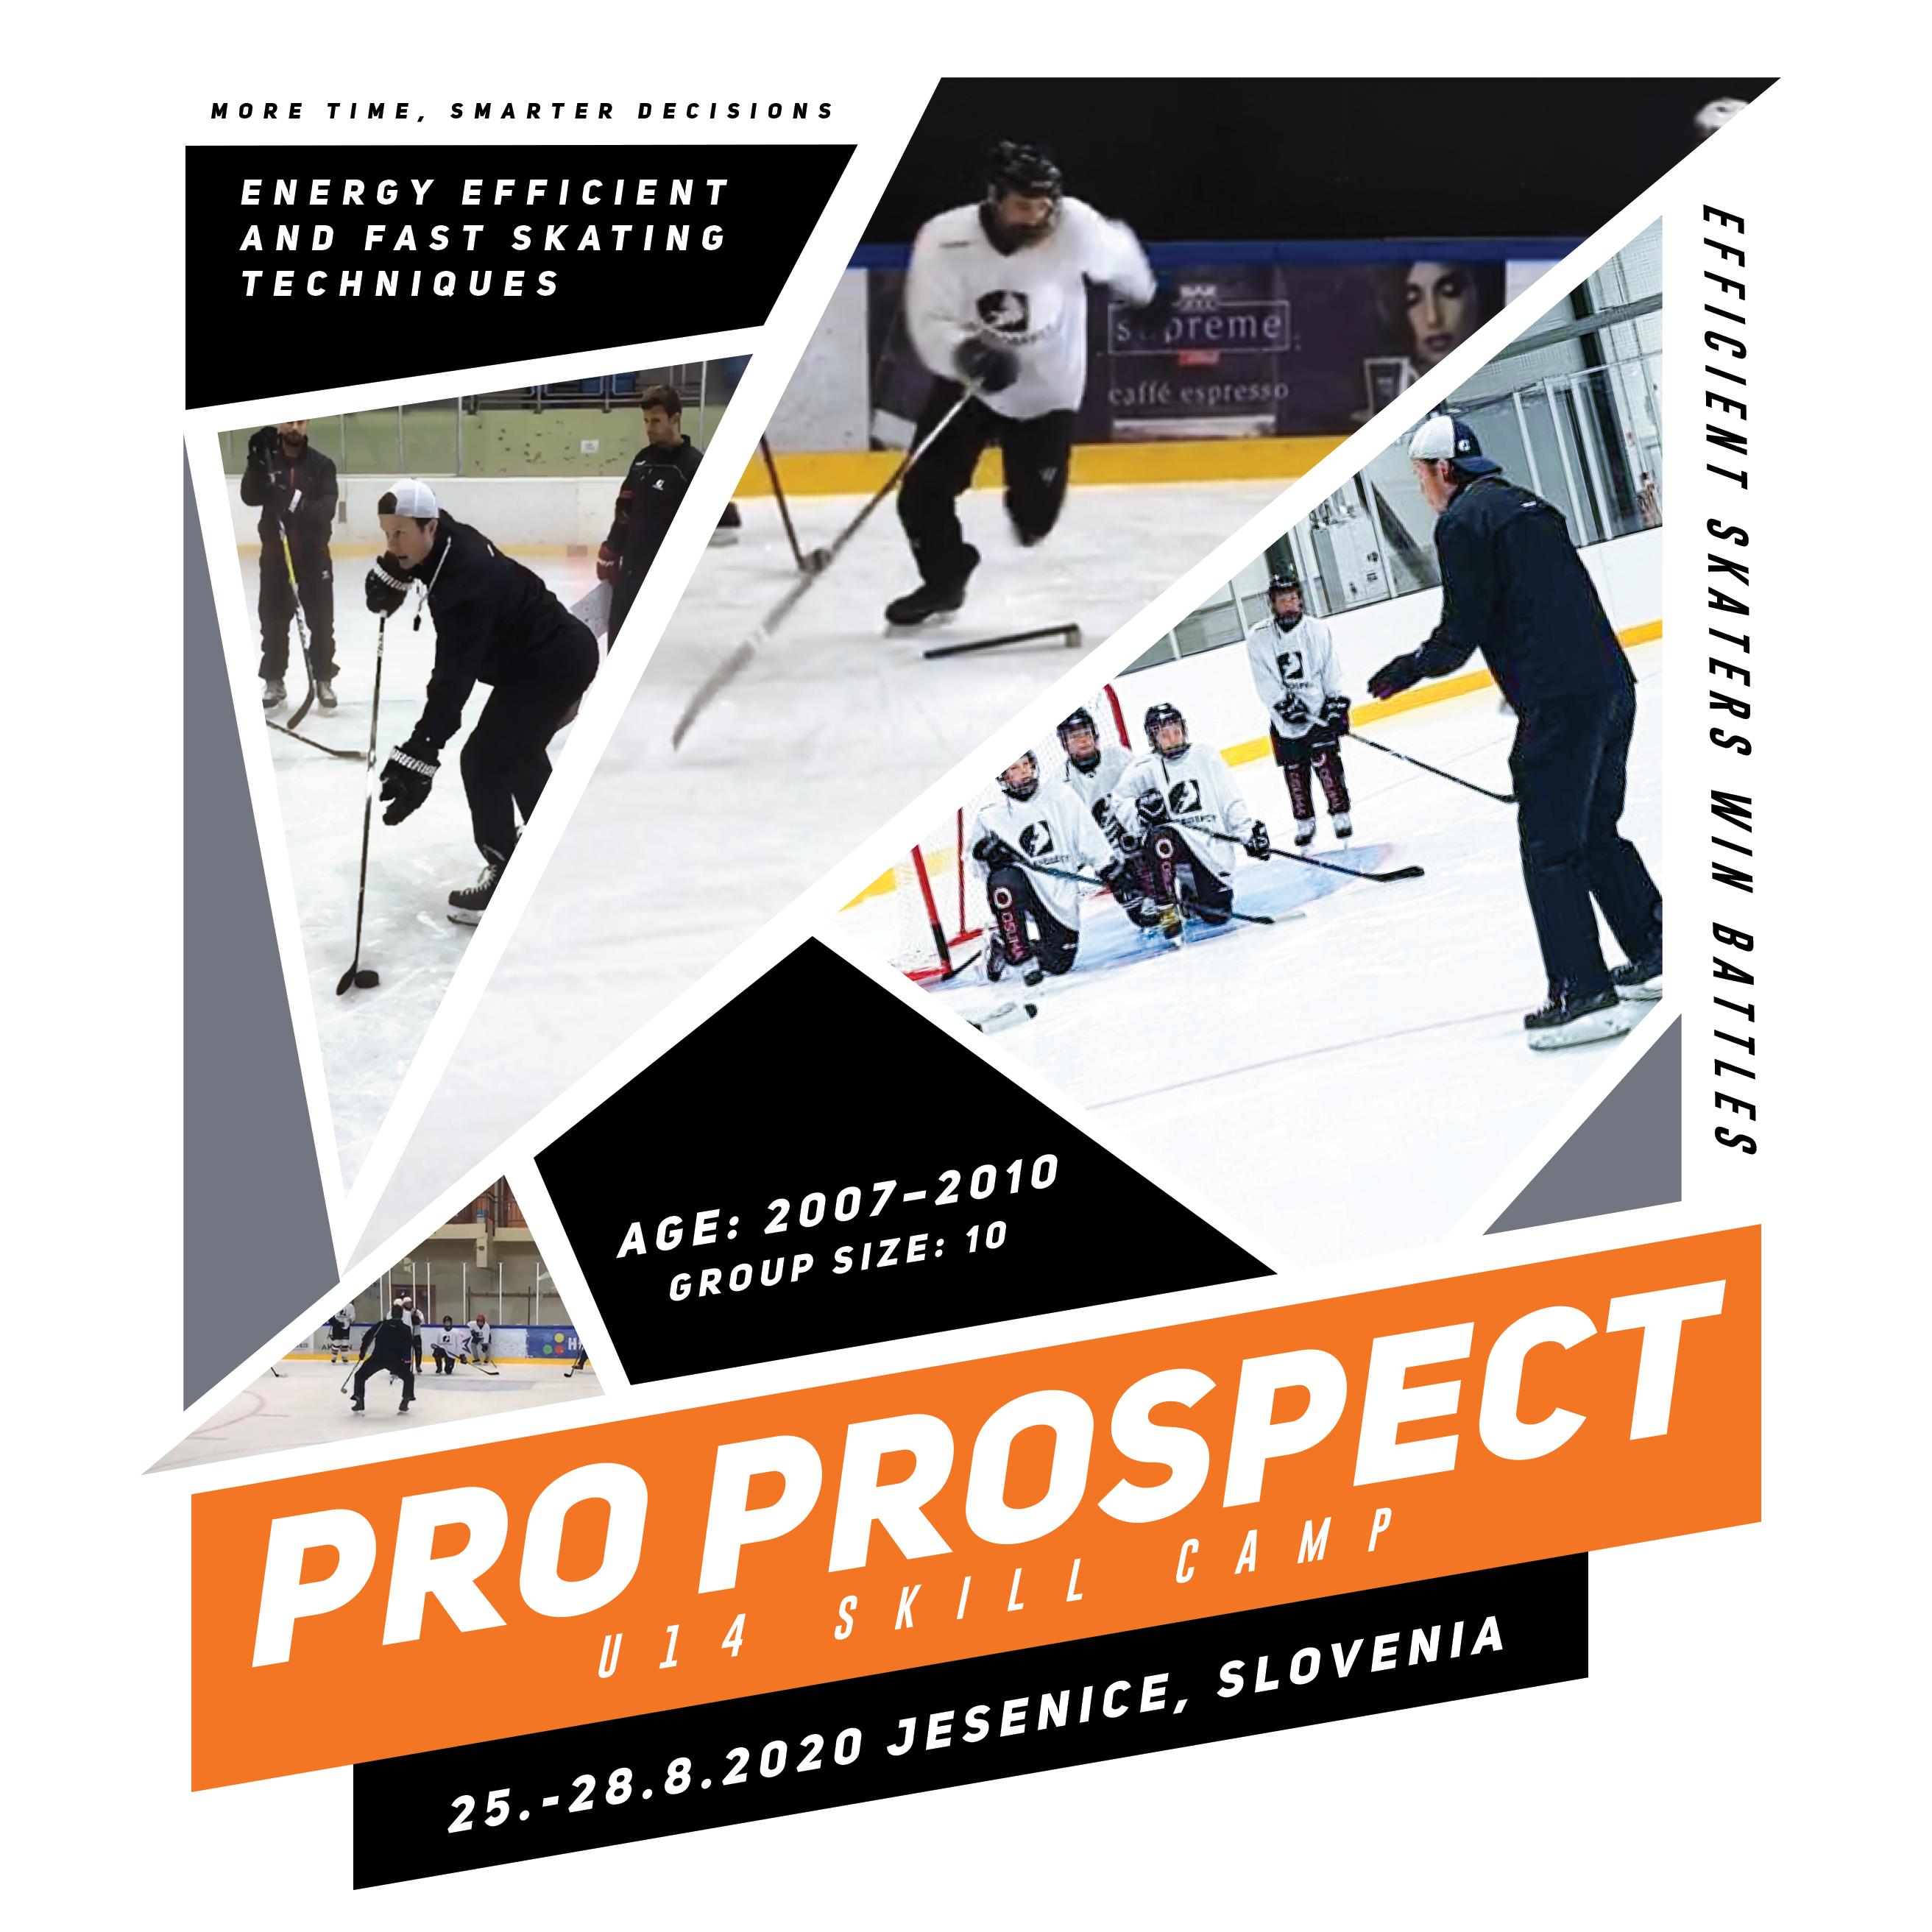 Ice Hockey Skating Skill Camp for U13 players in Jesenice, Slovenia